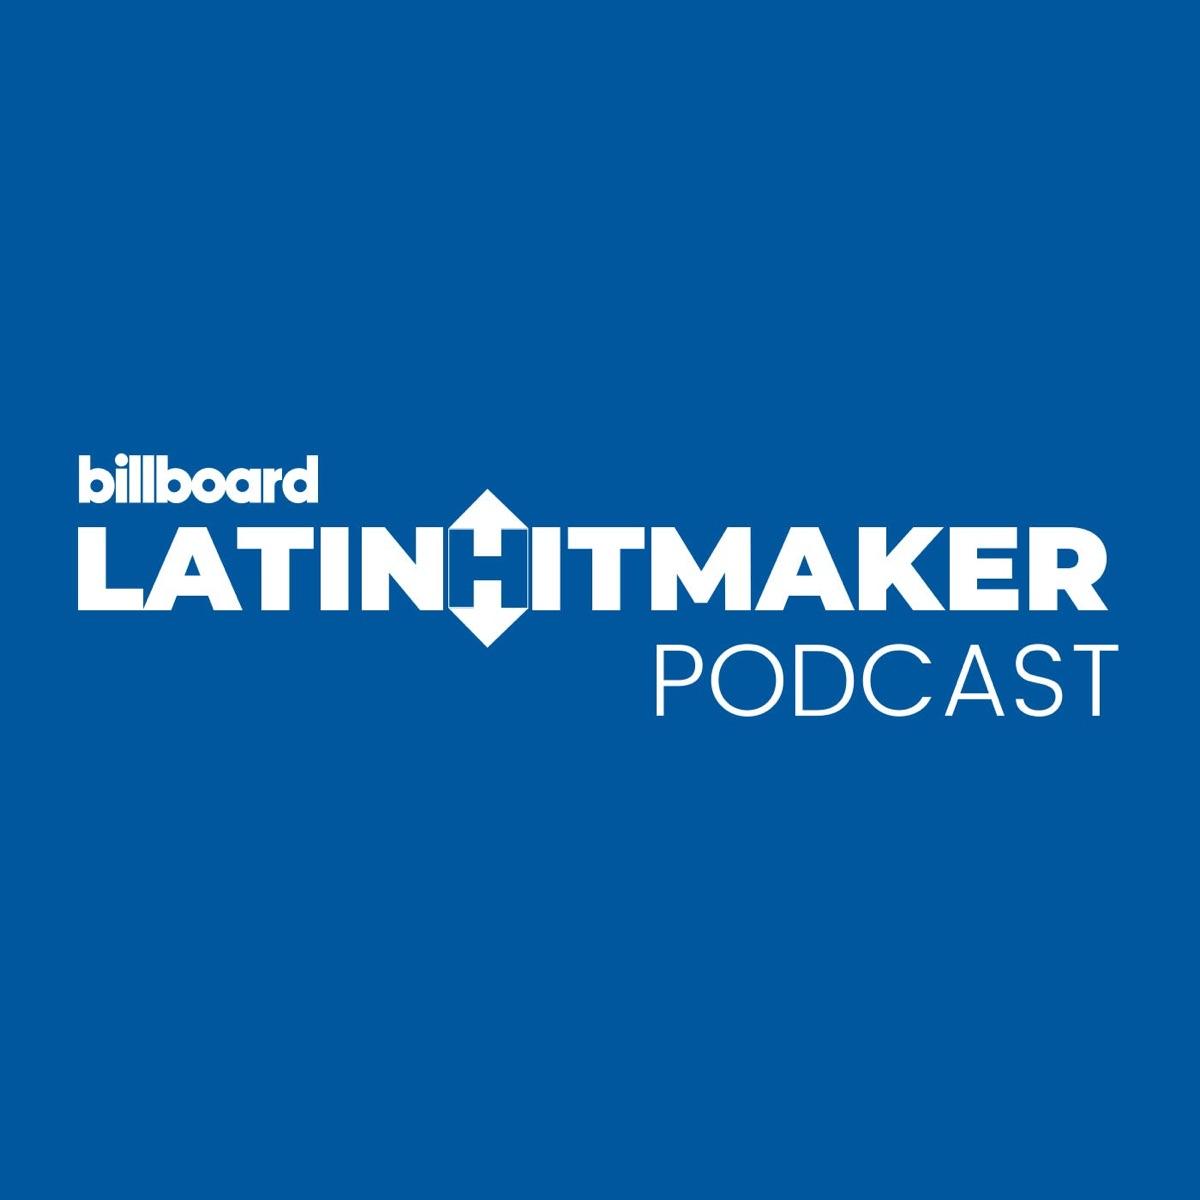 Billboard Latin Hitmaker